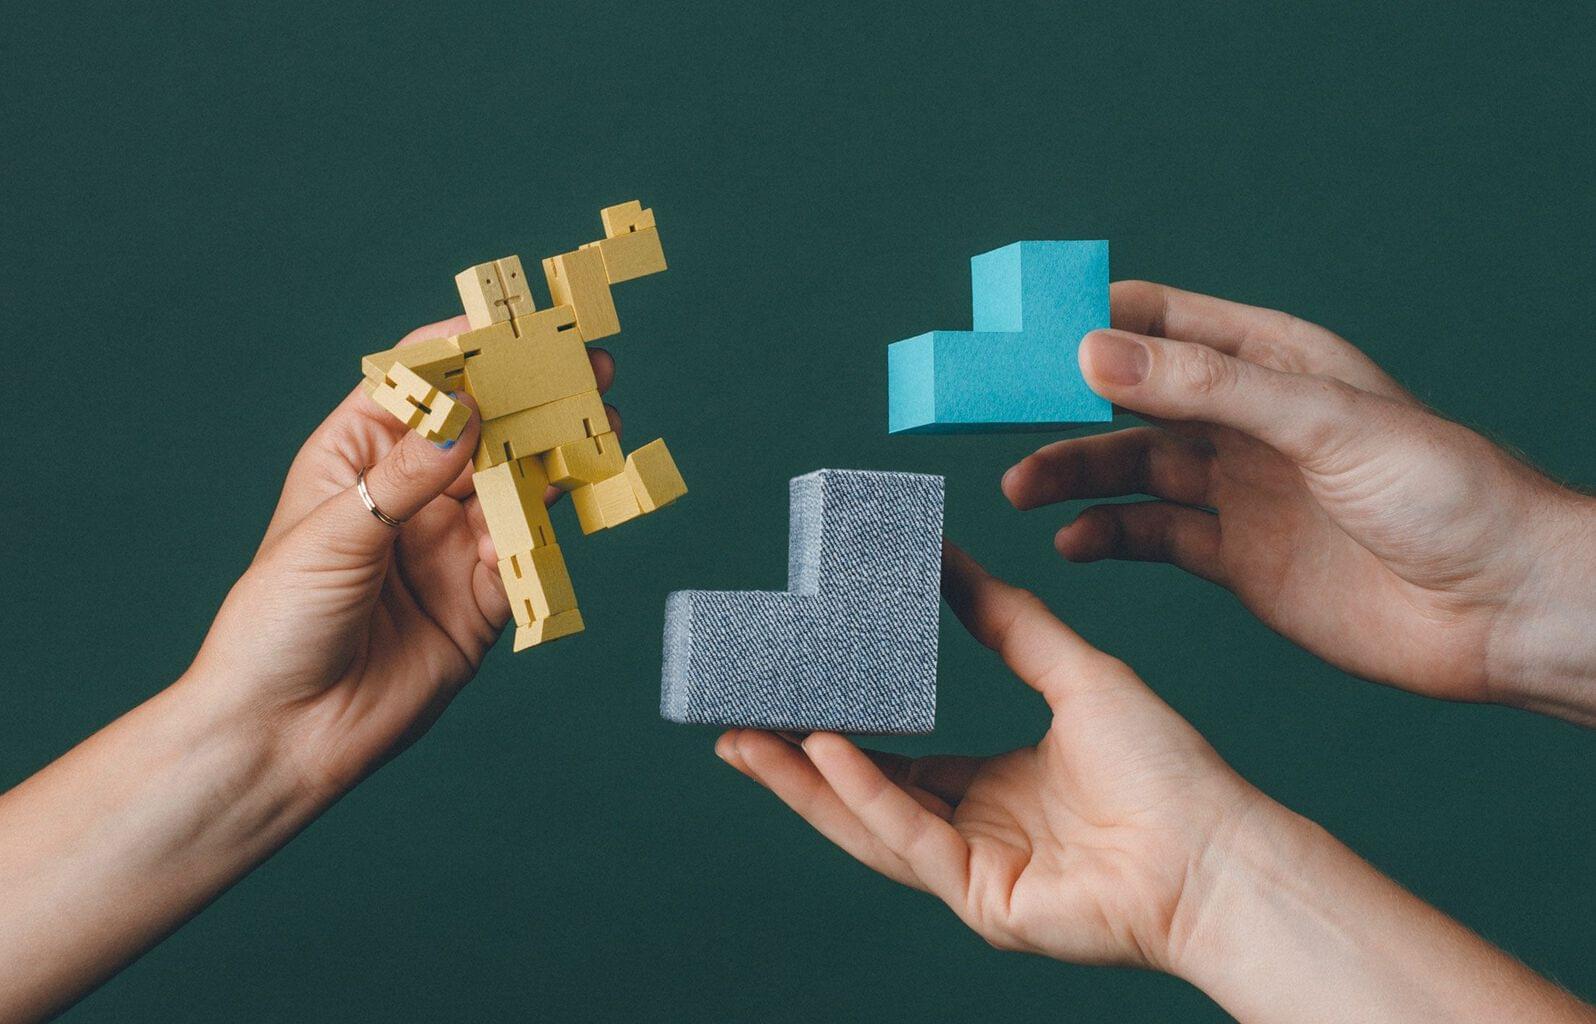 Gross sales vs. net sales: Key differences explained